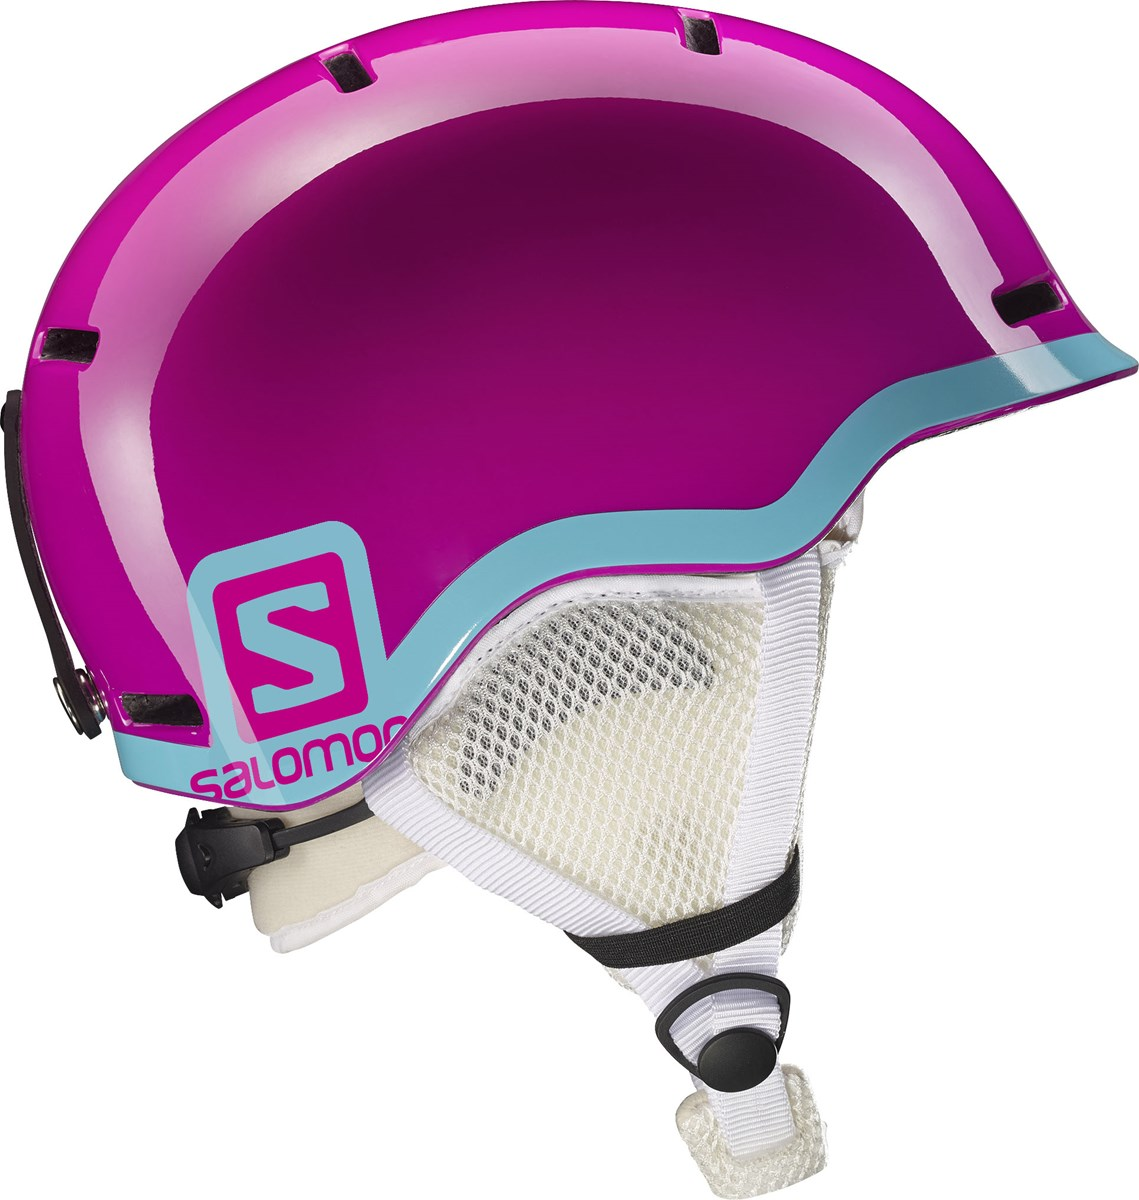 28f2c78fa20d Salomon Grom Junior Ski Helmet in Fushia Blue - The Ski Shop £45.00